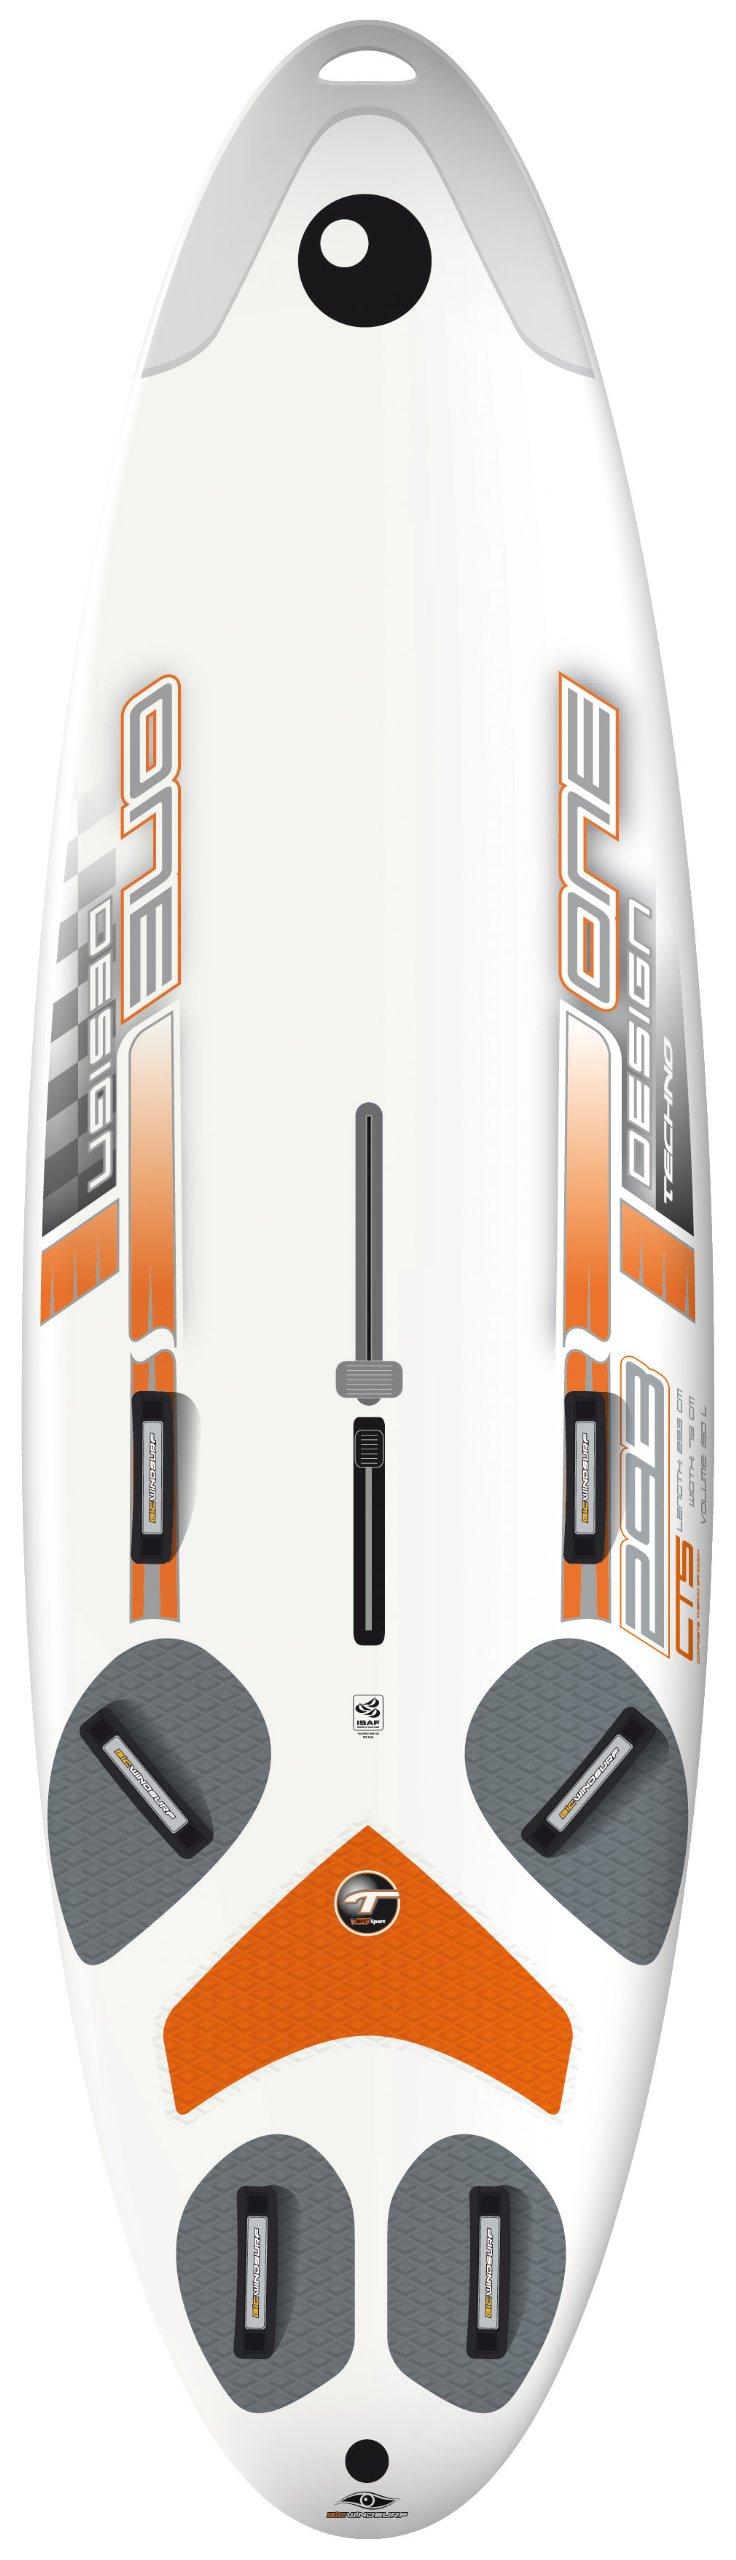 BIC Sport Techno 293 One Design DTT One Design Sailboard (White, 293x79-cmx12.5-kg)